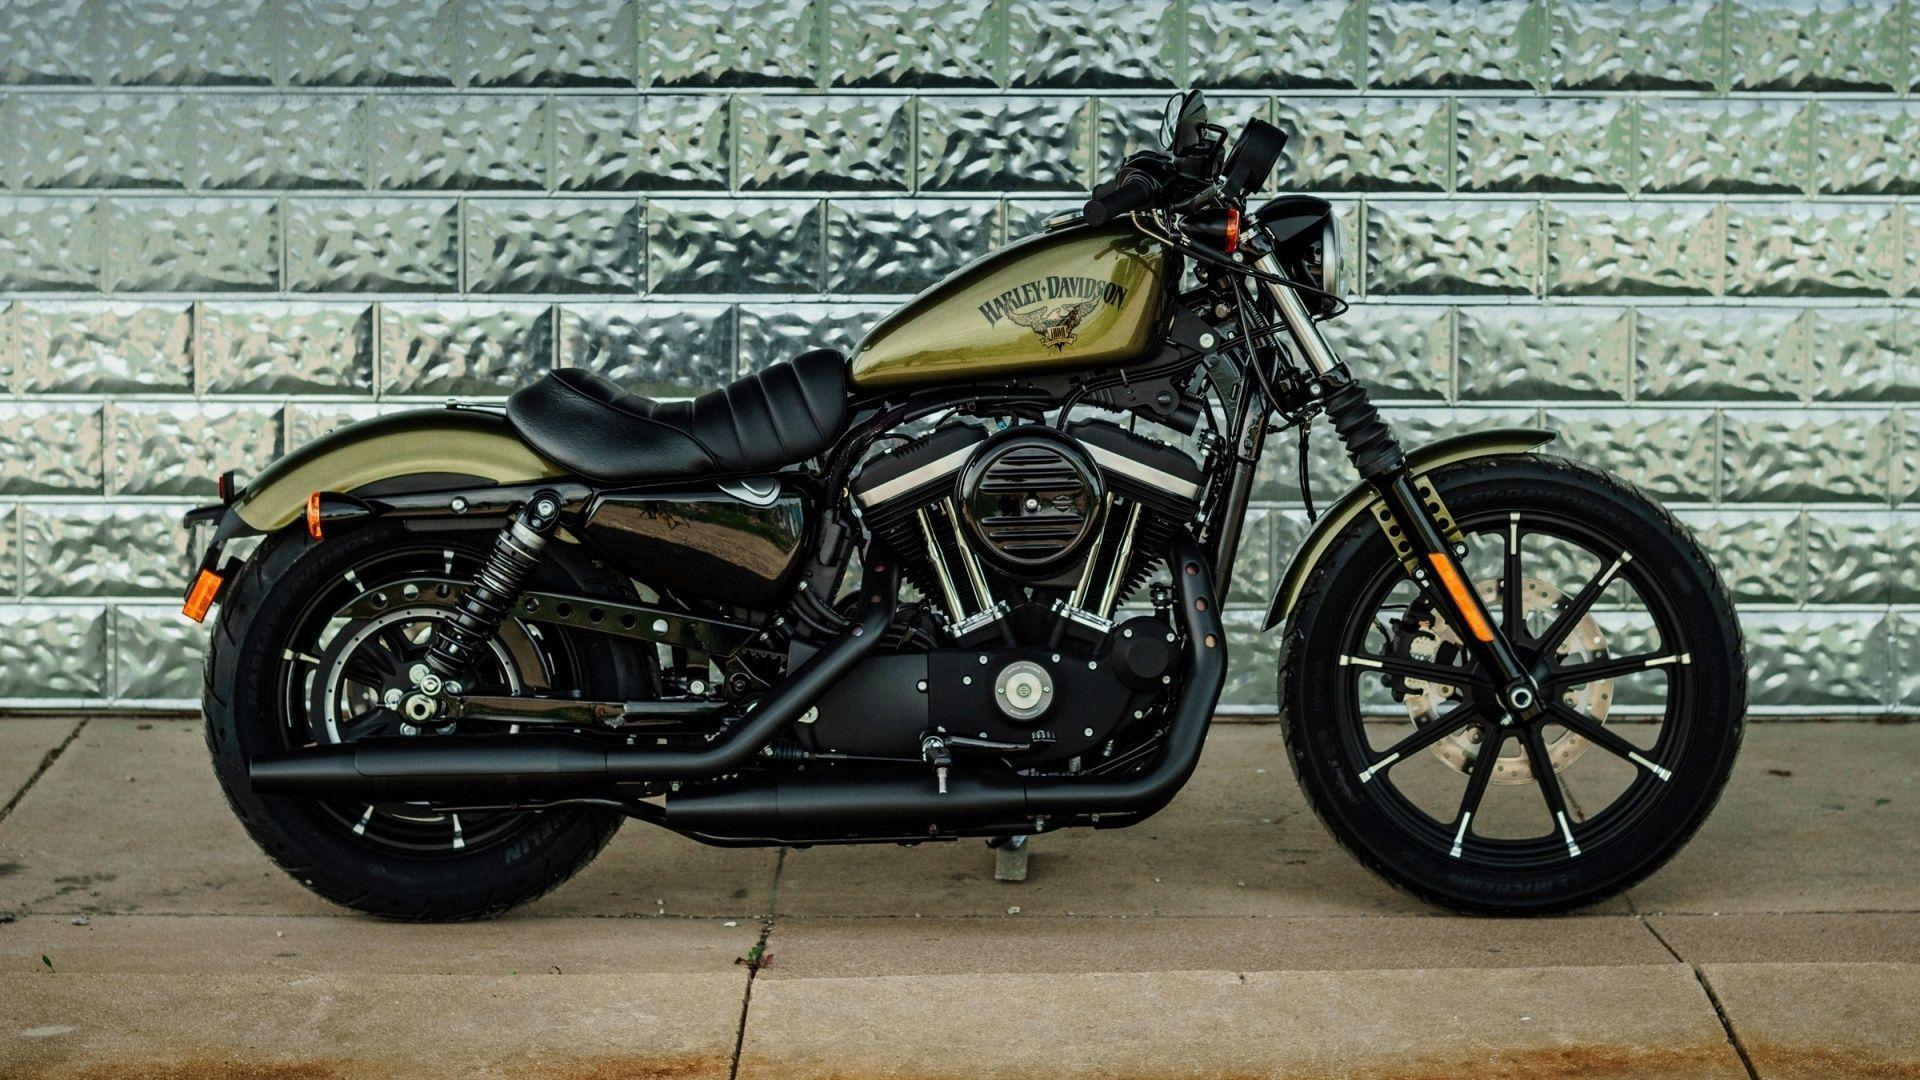 Wallpapers 2016 Harley Davidson Iron 883 Wallpaper Cave